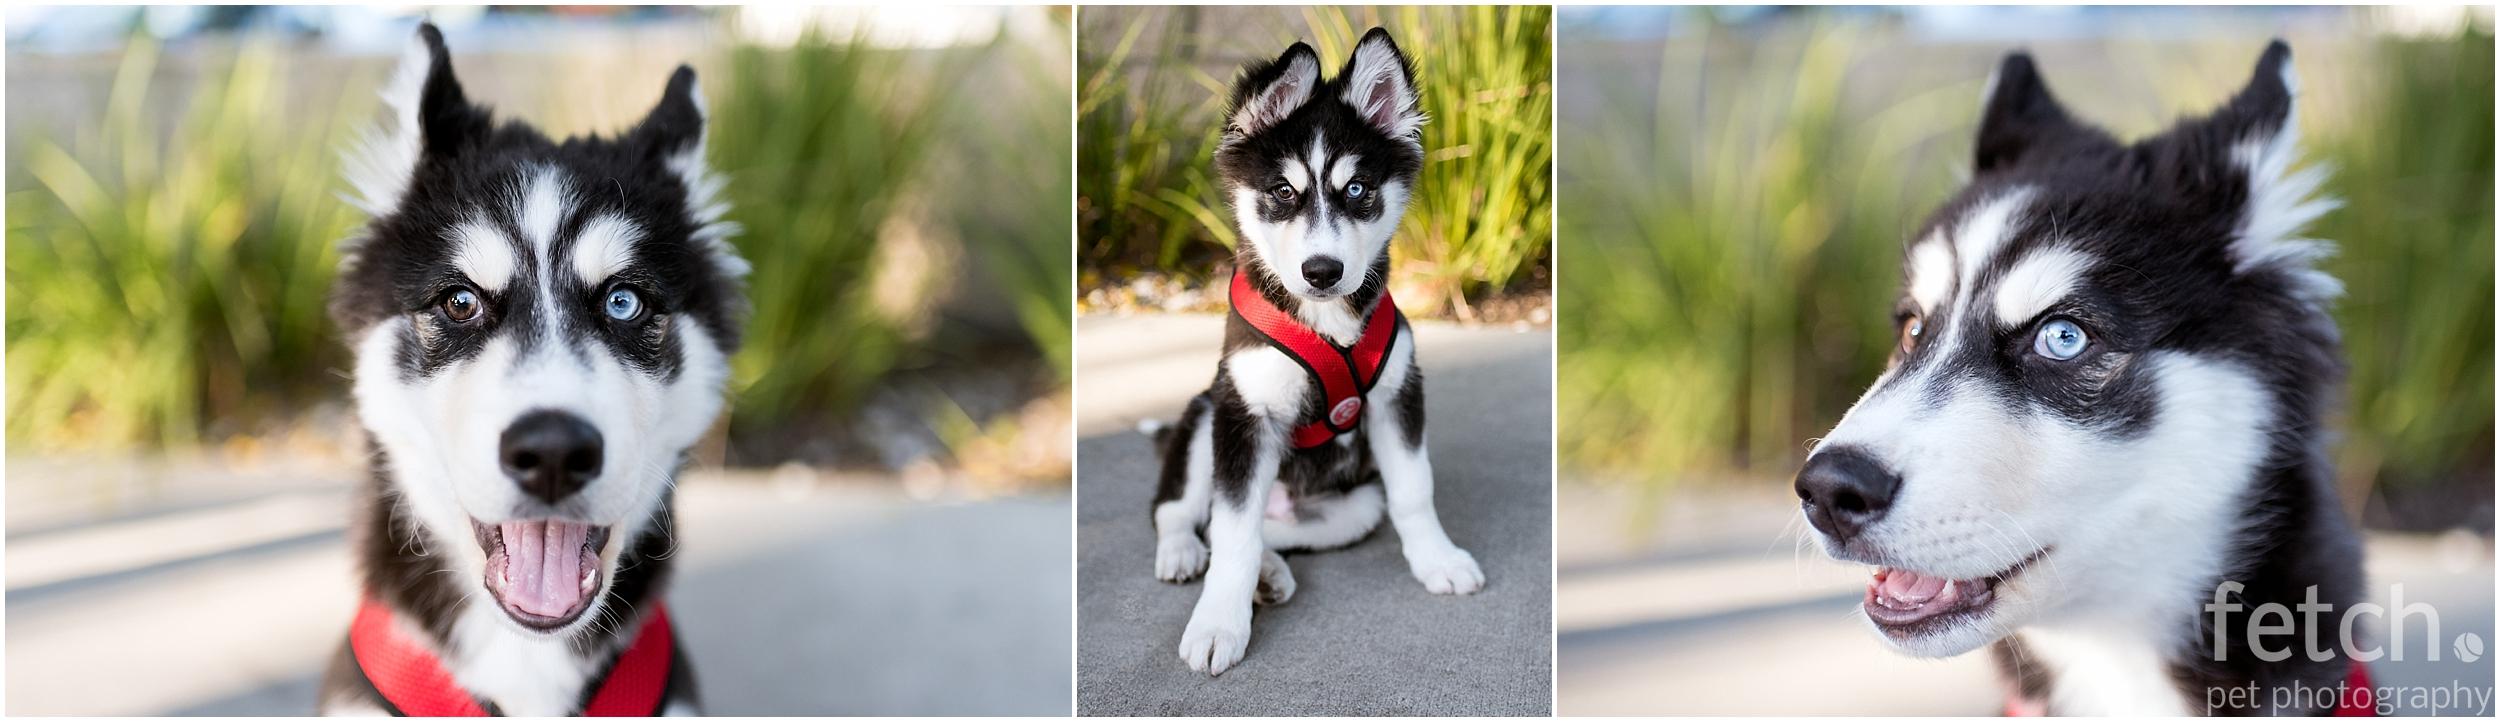 cute-puppy-siberian-husky